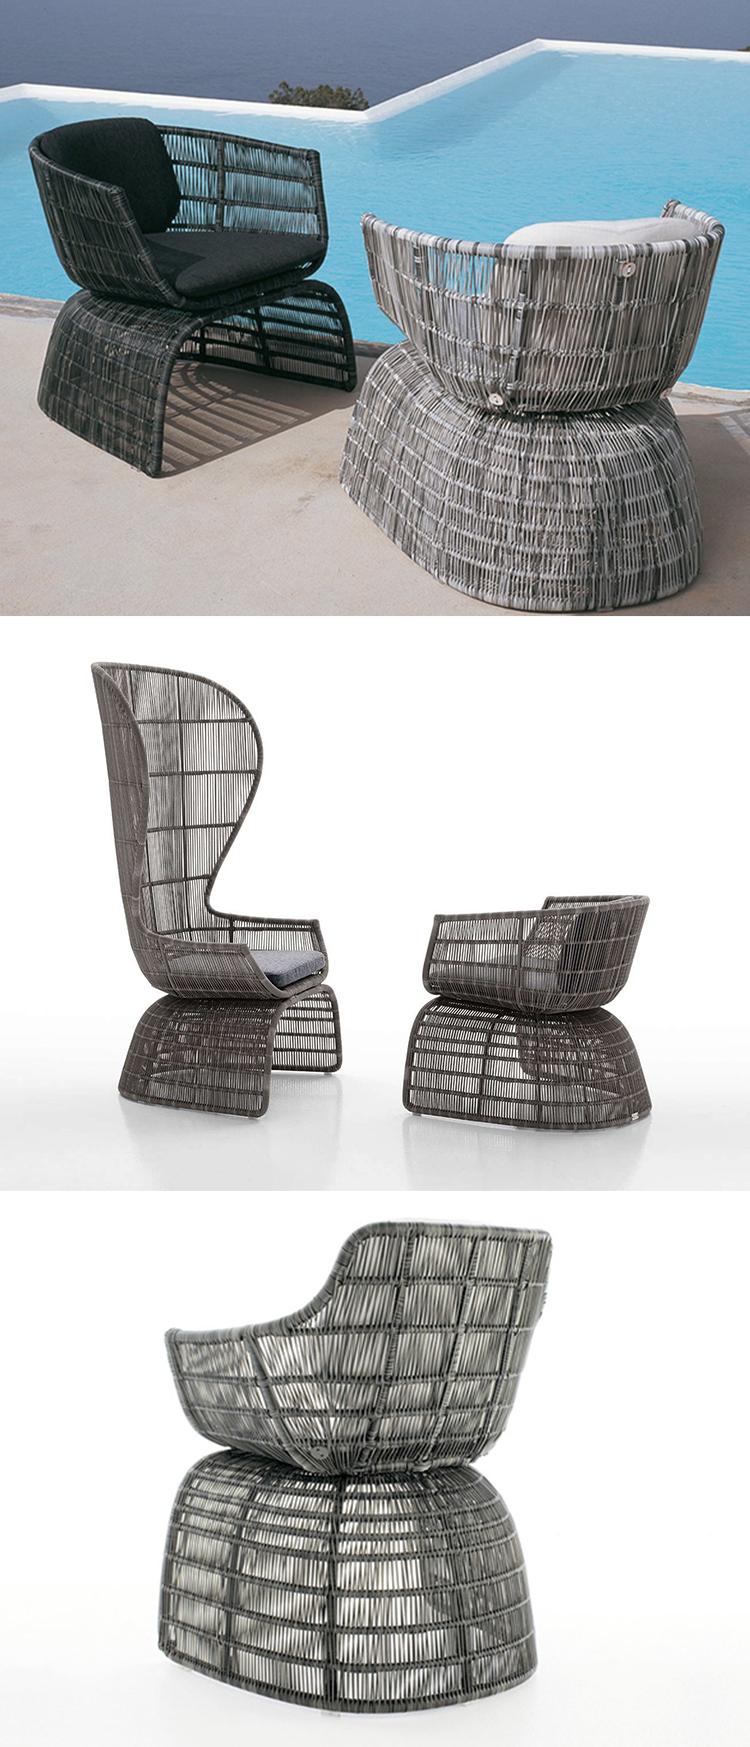 New design muebles terraza rattan outdoor furniture sofa set